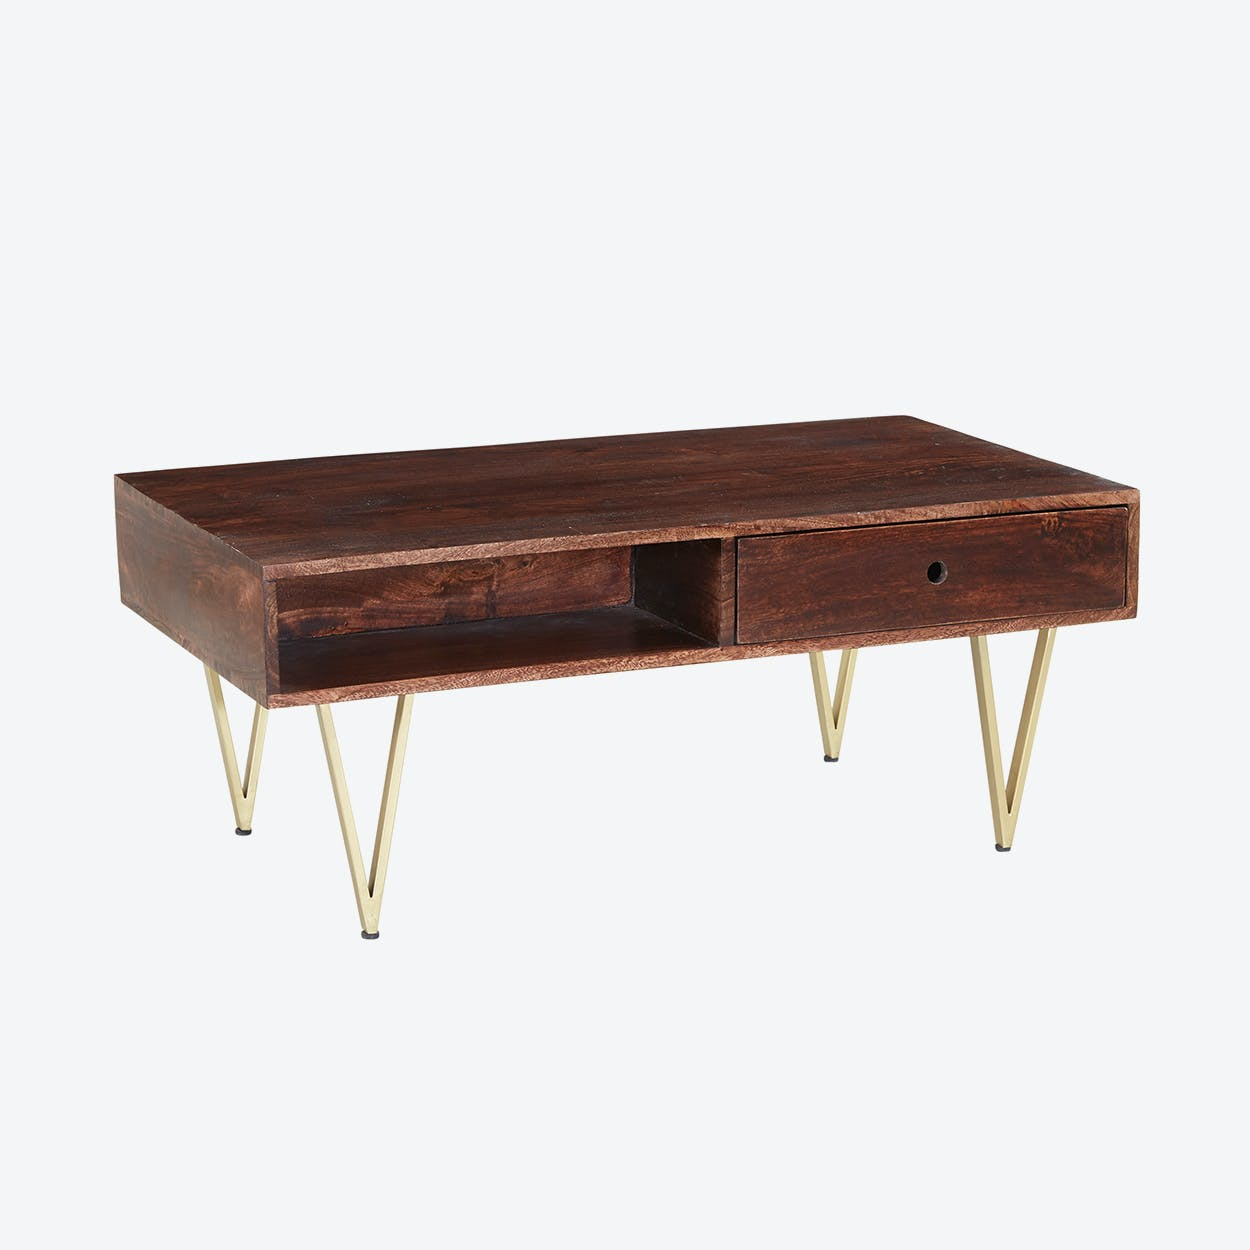 Wooden Rectangular Coffee Table